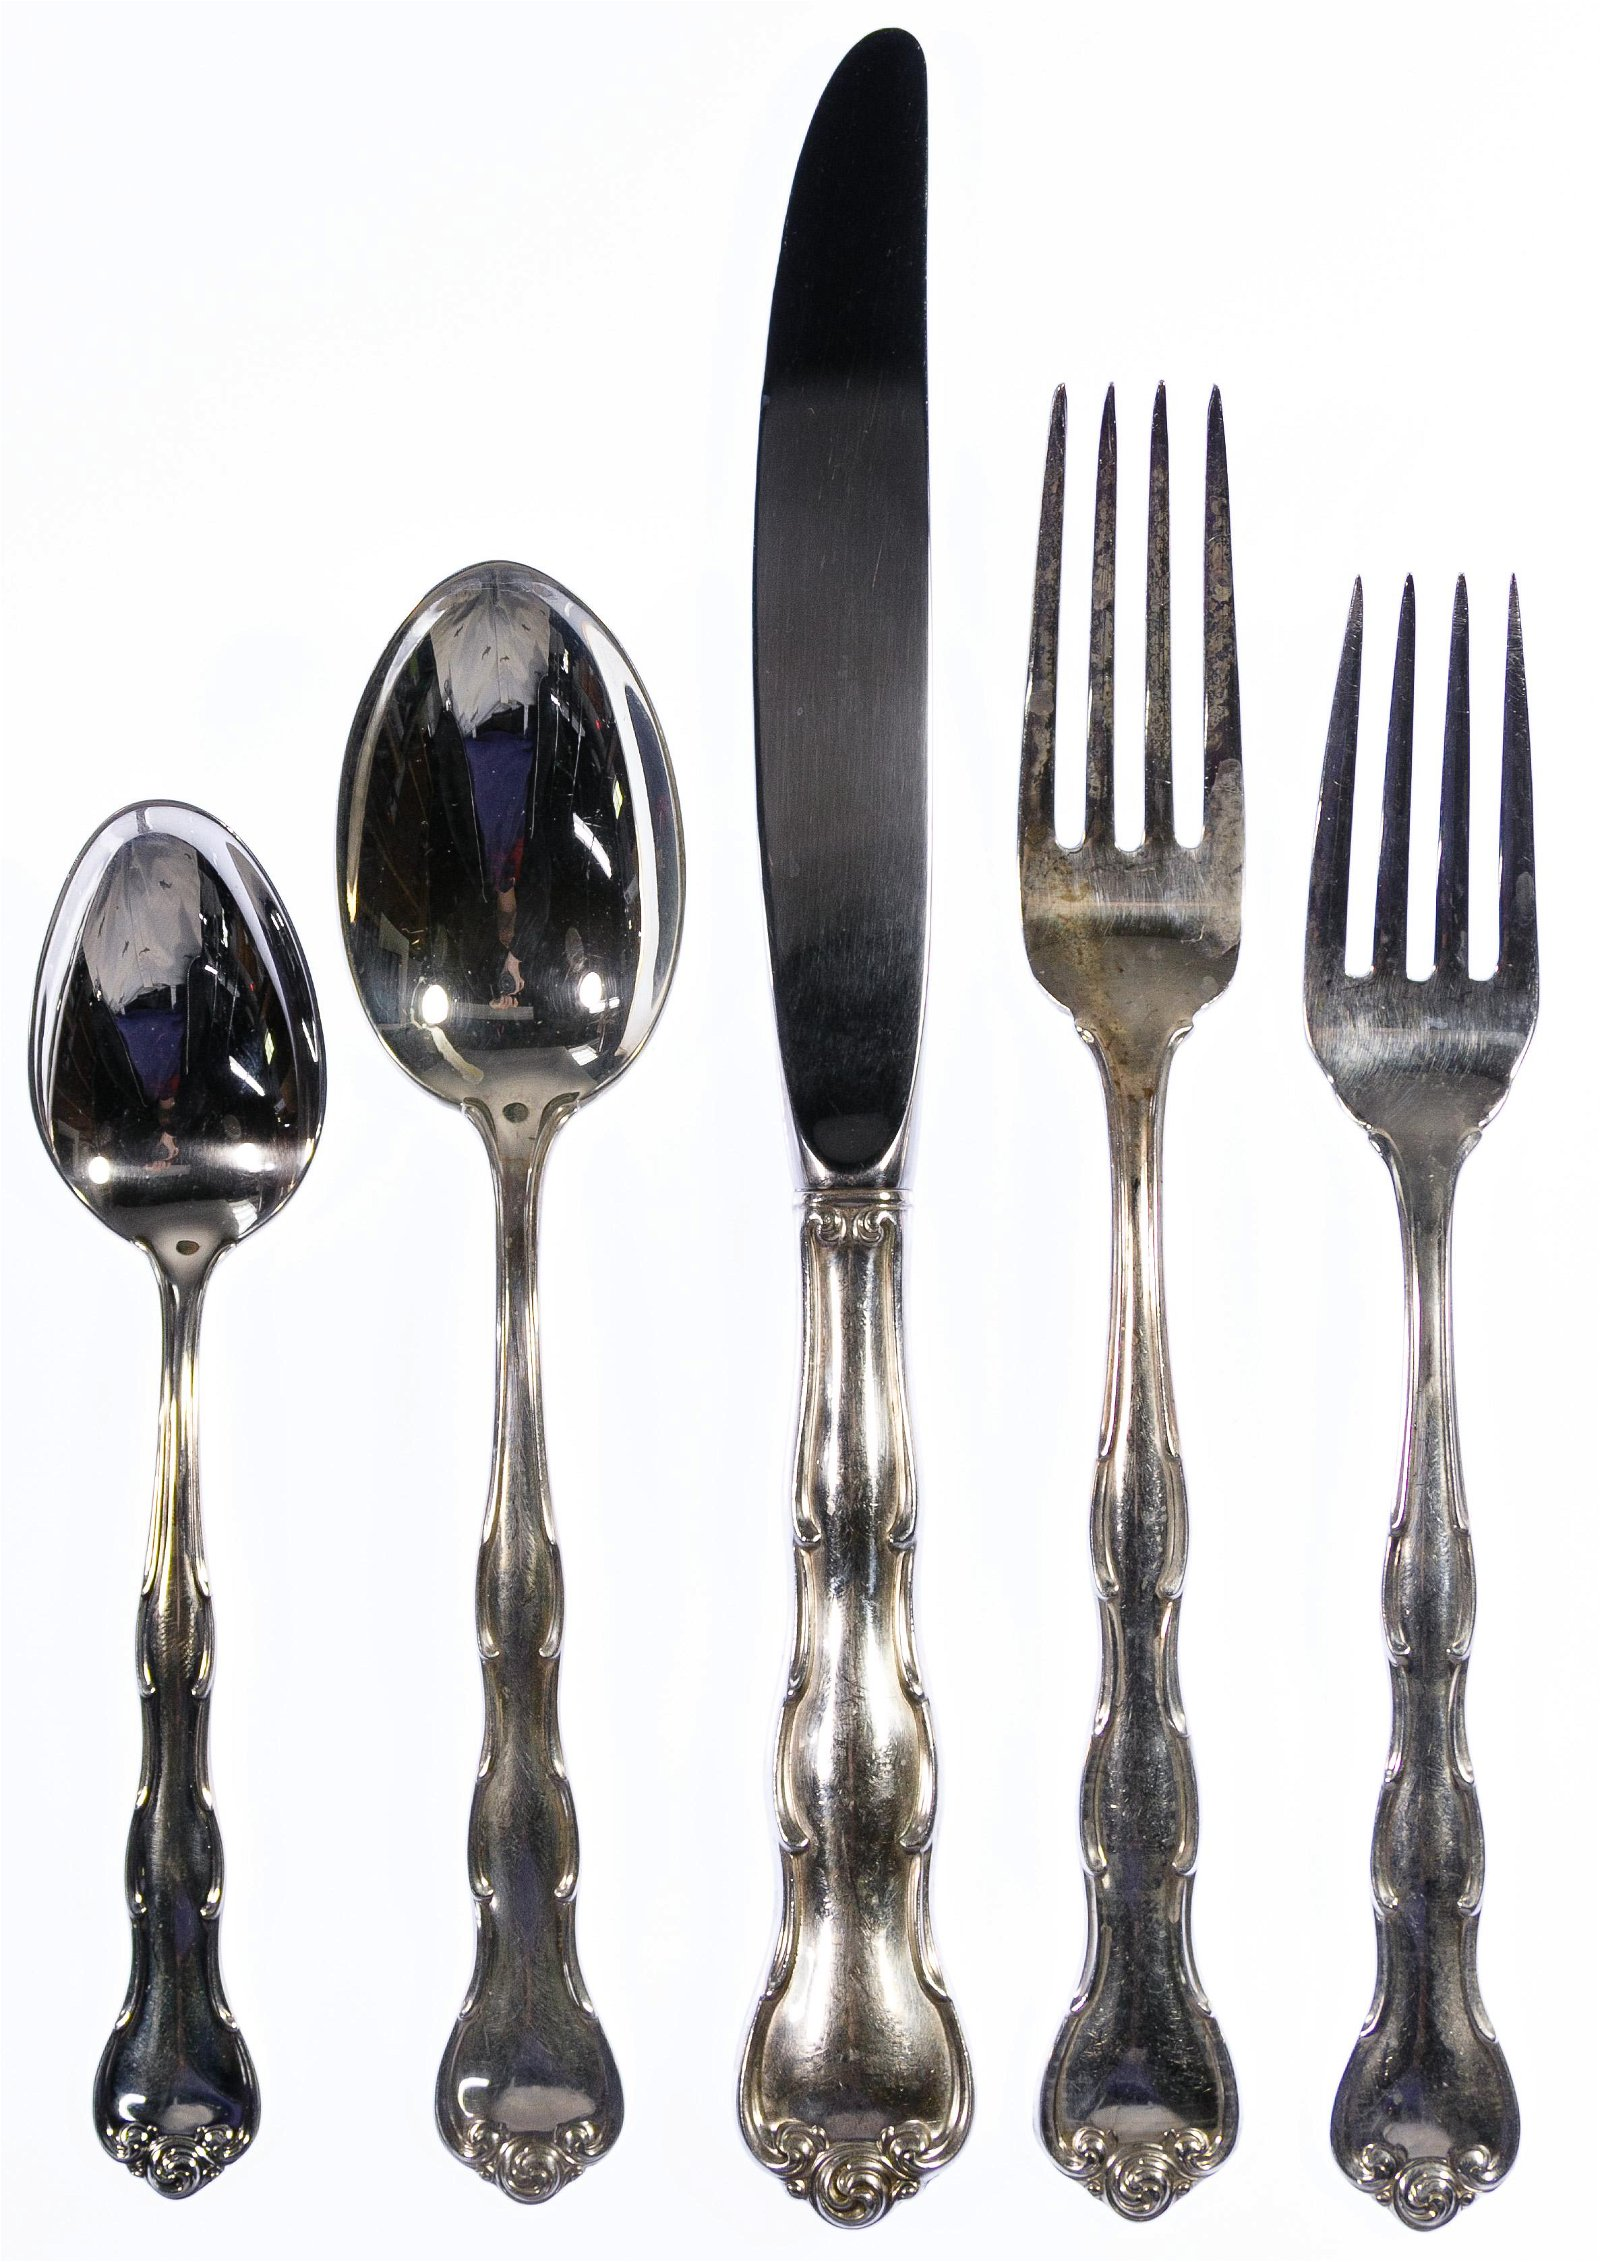 Gorham 'Rondo' Sterling Silver Flatware Service